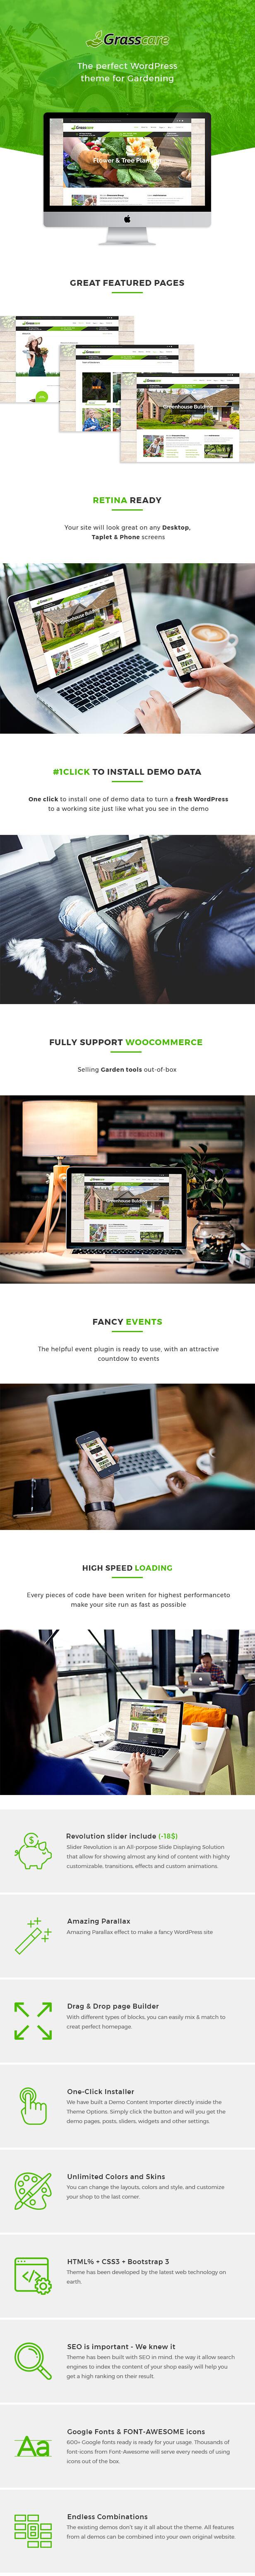 GrassCare - Gardening & Lawn Responsive WordPress Theme - 5